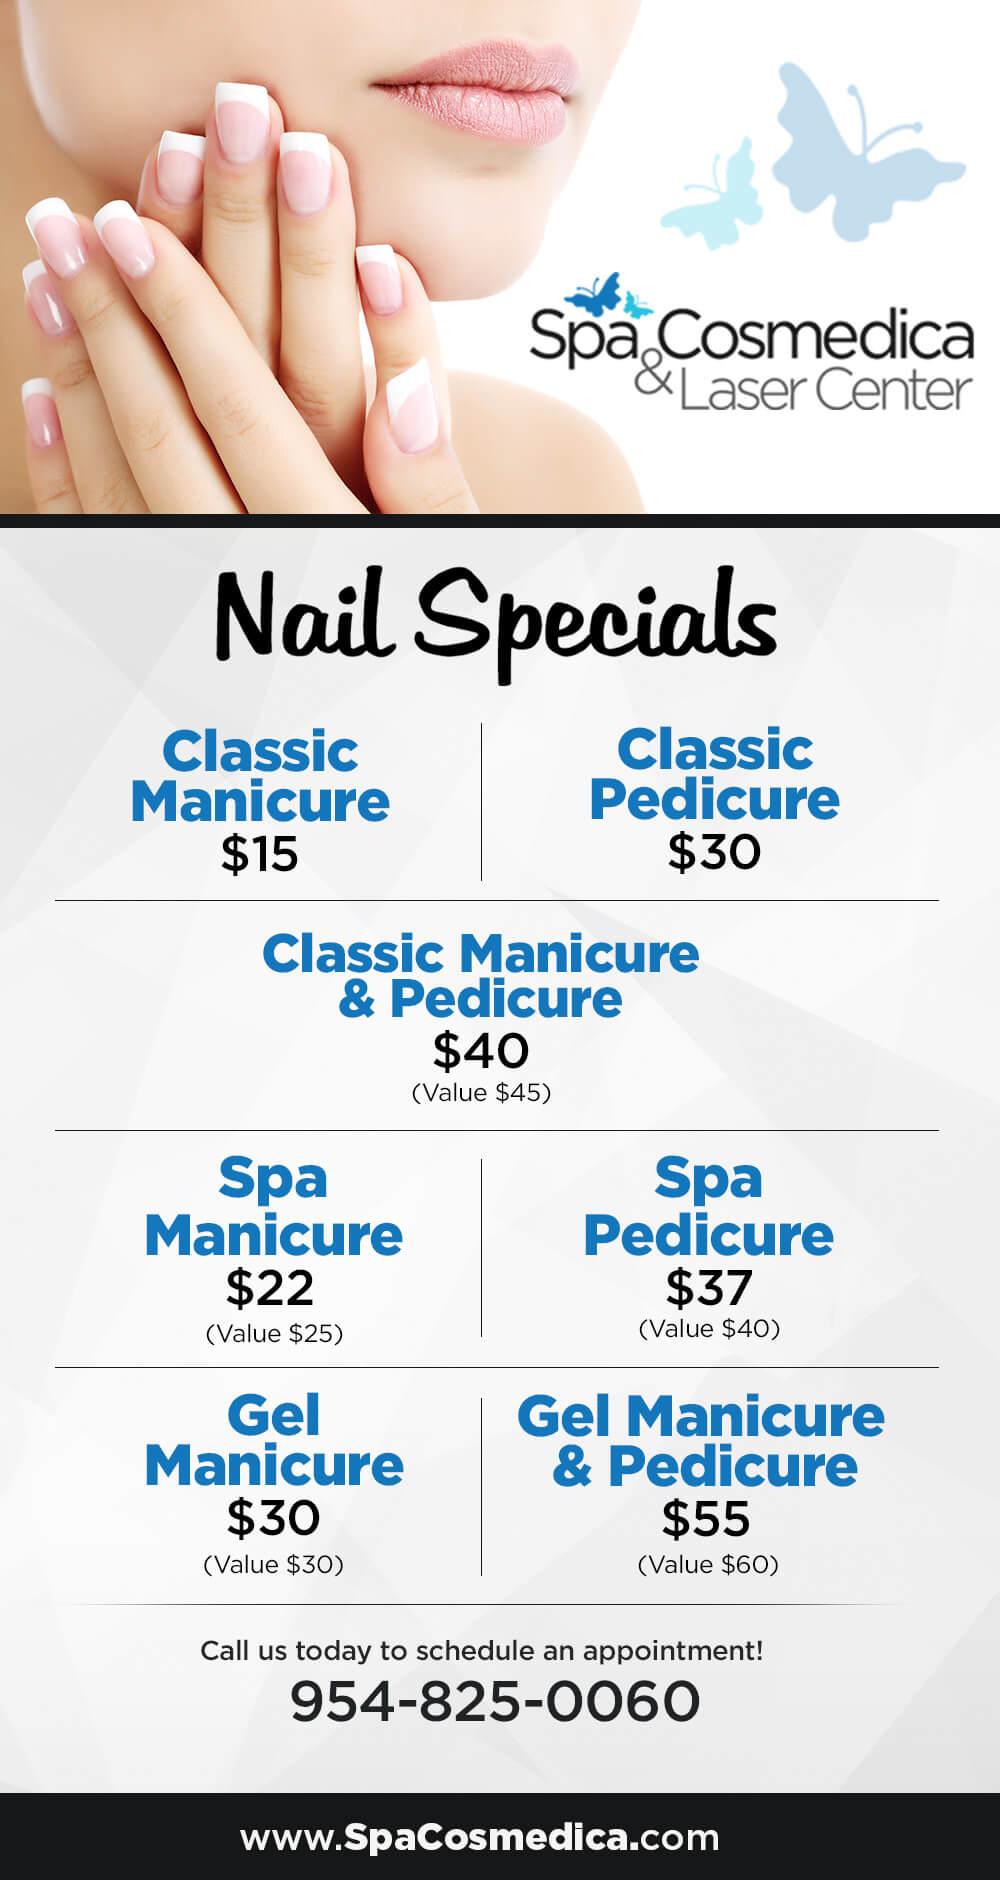 Nail Specials